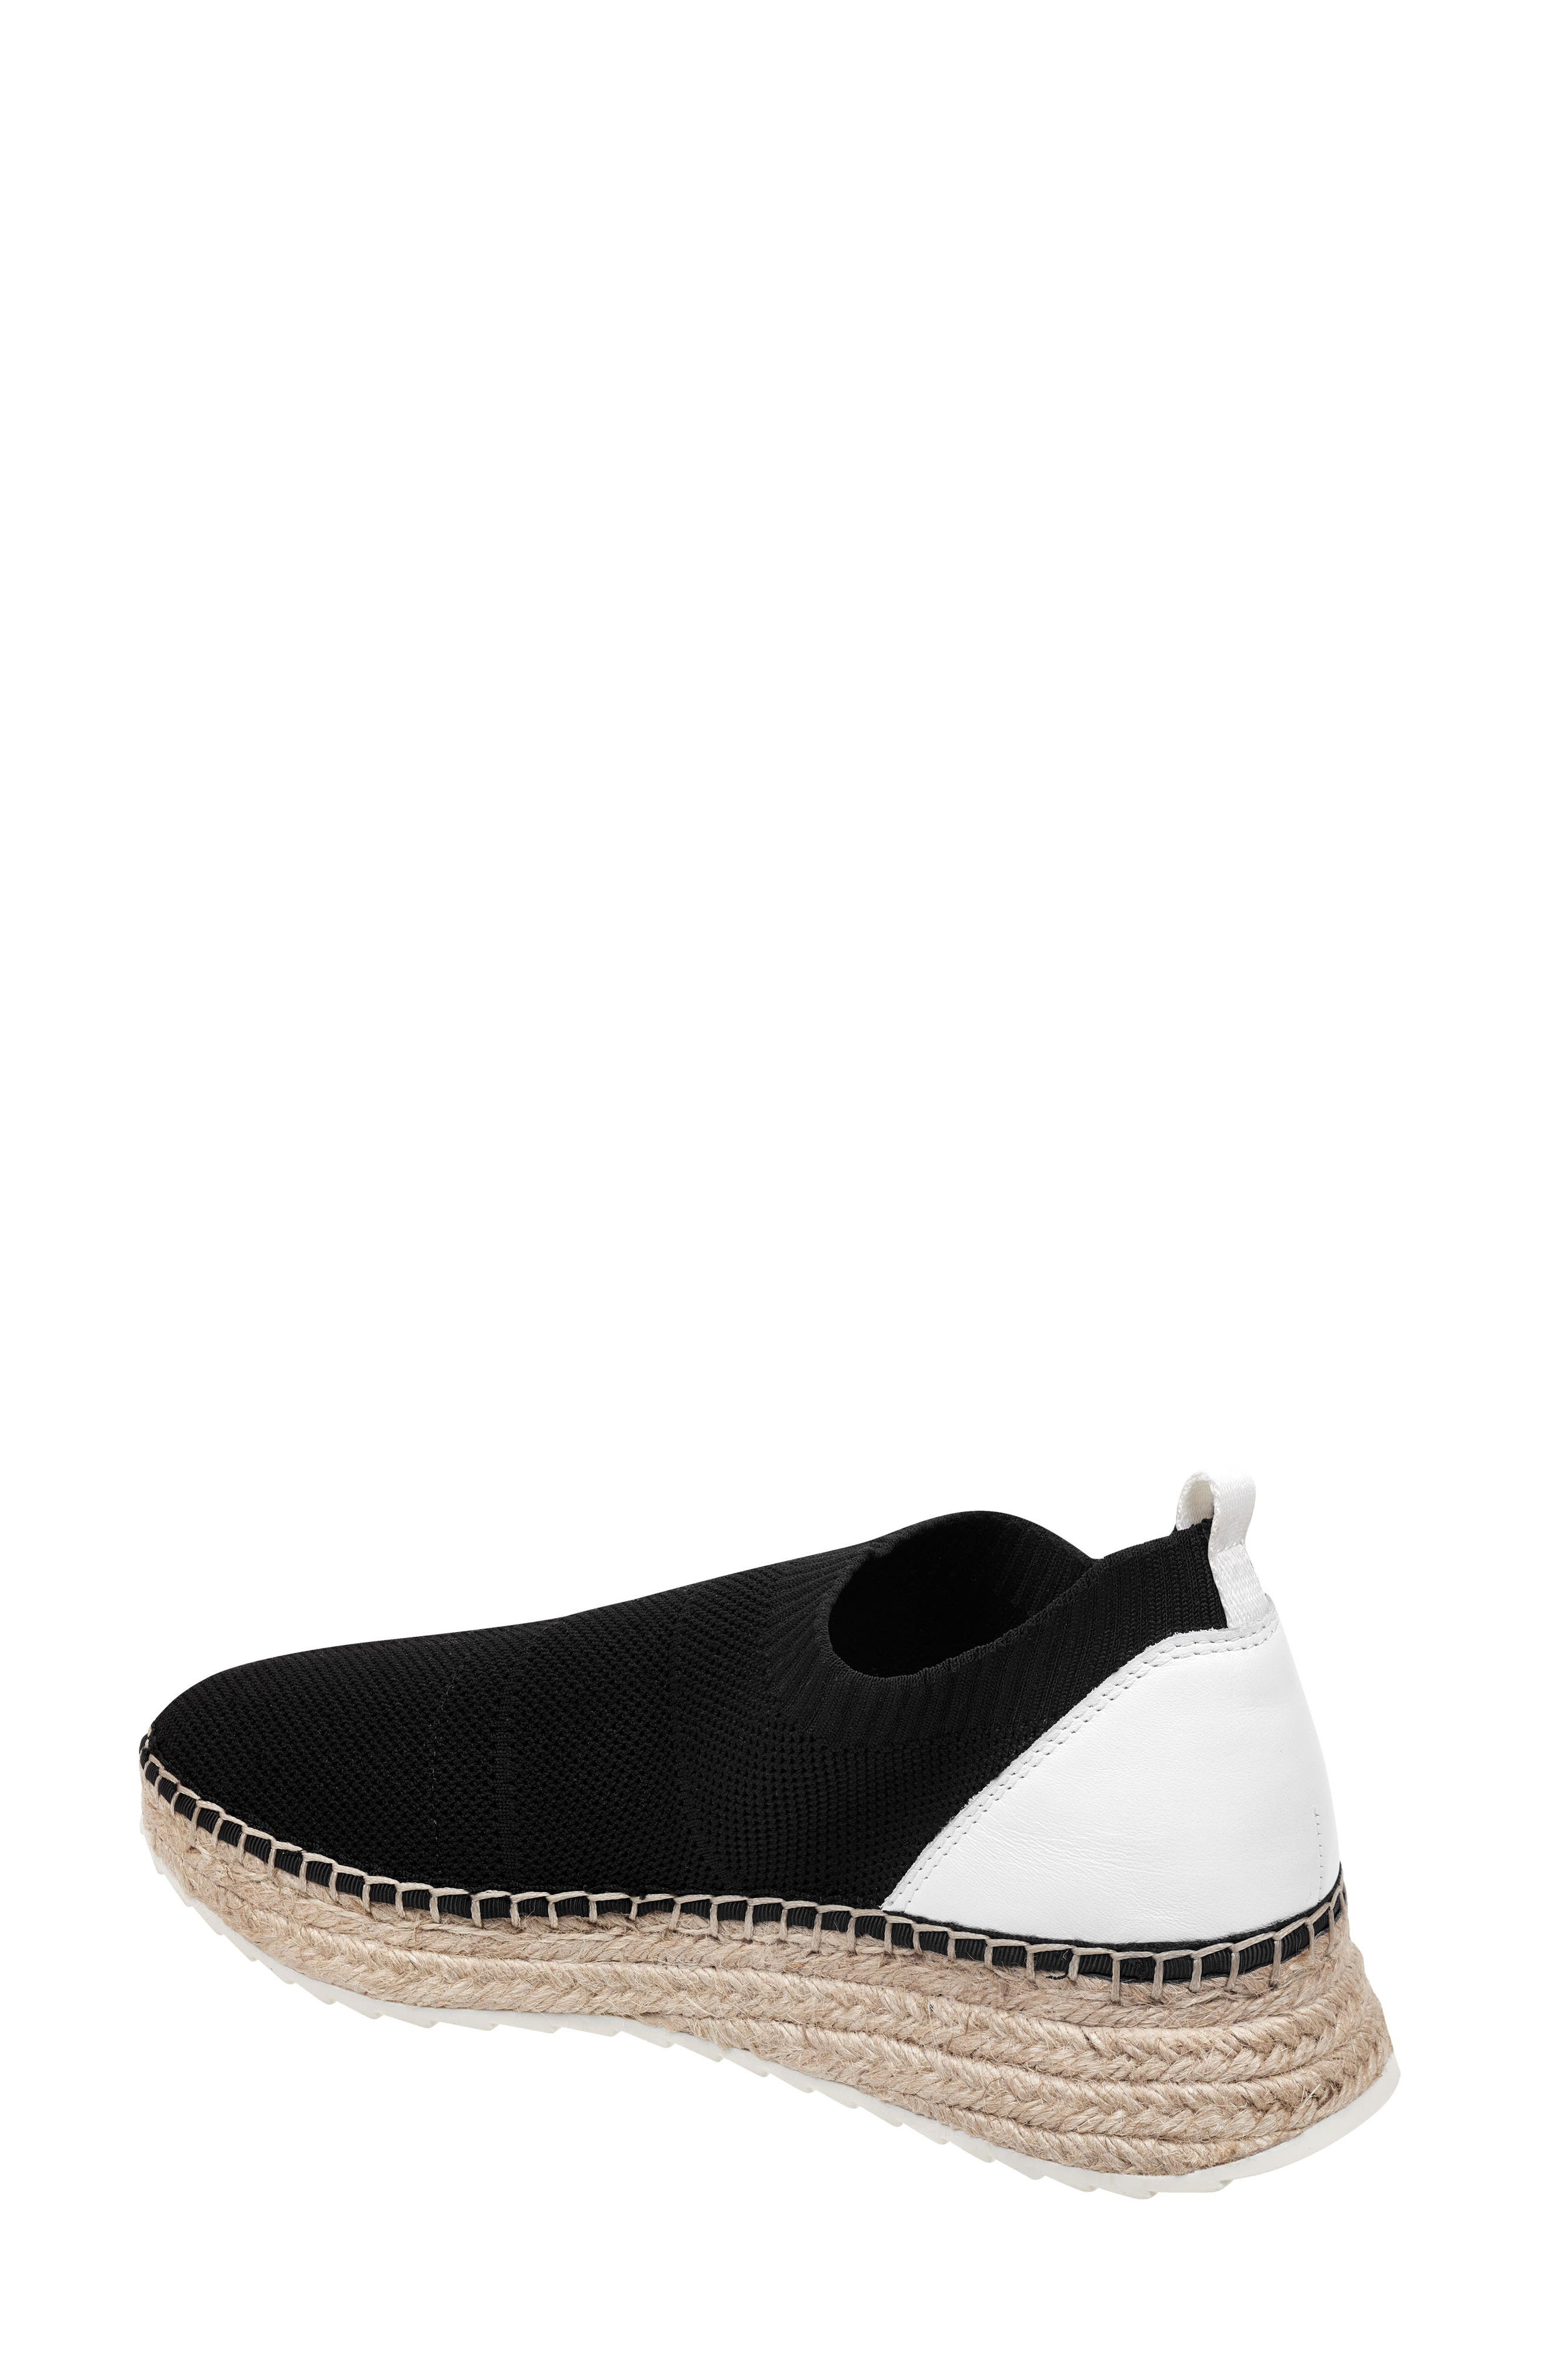 MARC FISHER LTD,                             Jilly Espadrille Sneaker,                             Alternate thumbnail 2, color,                             BLACK FABRIC